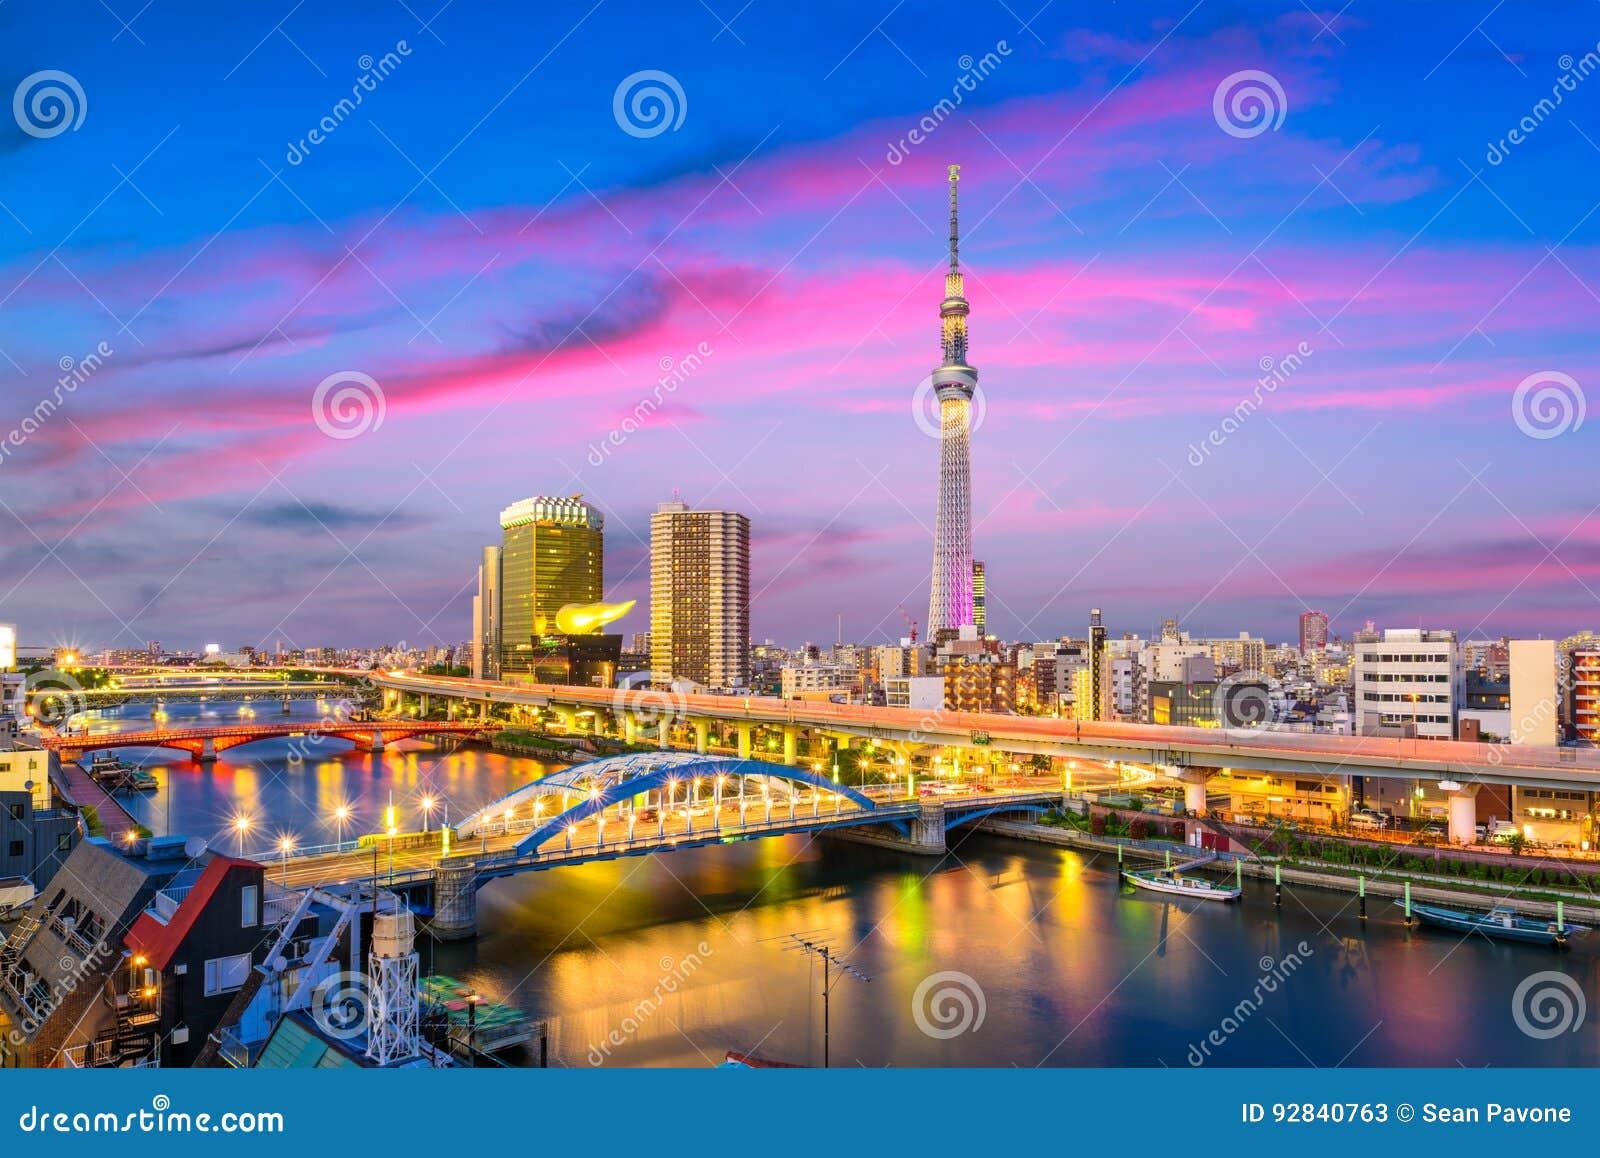 Tokyo, Japan Sumida Skyline